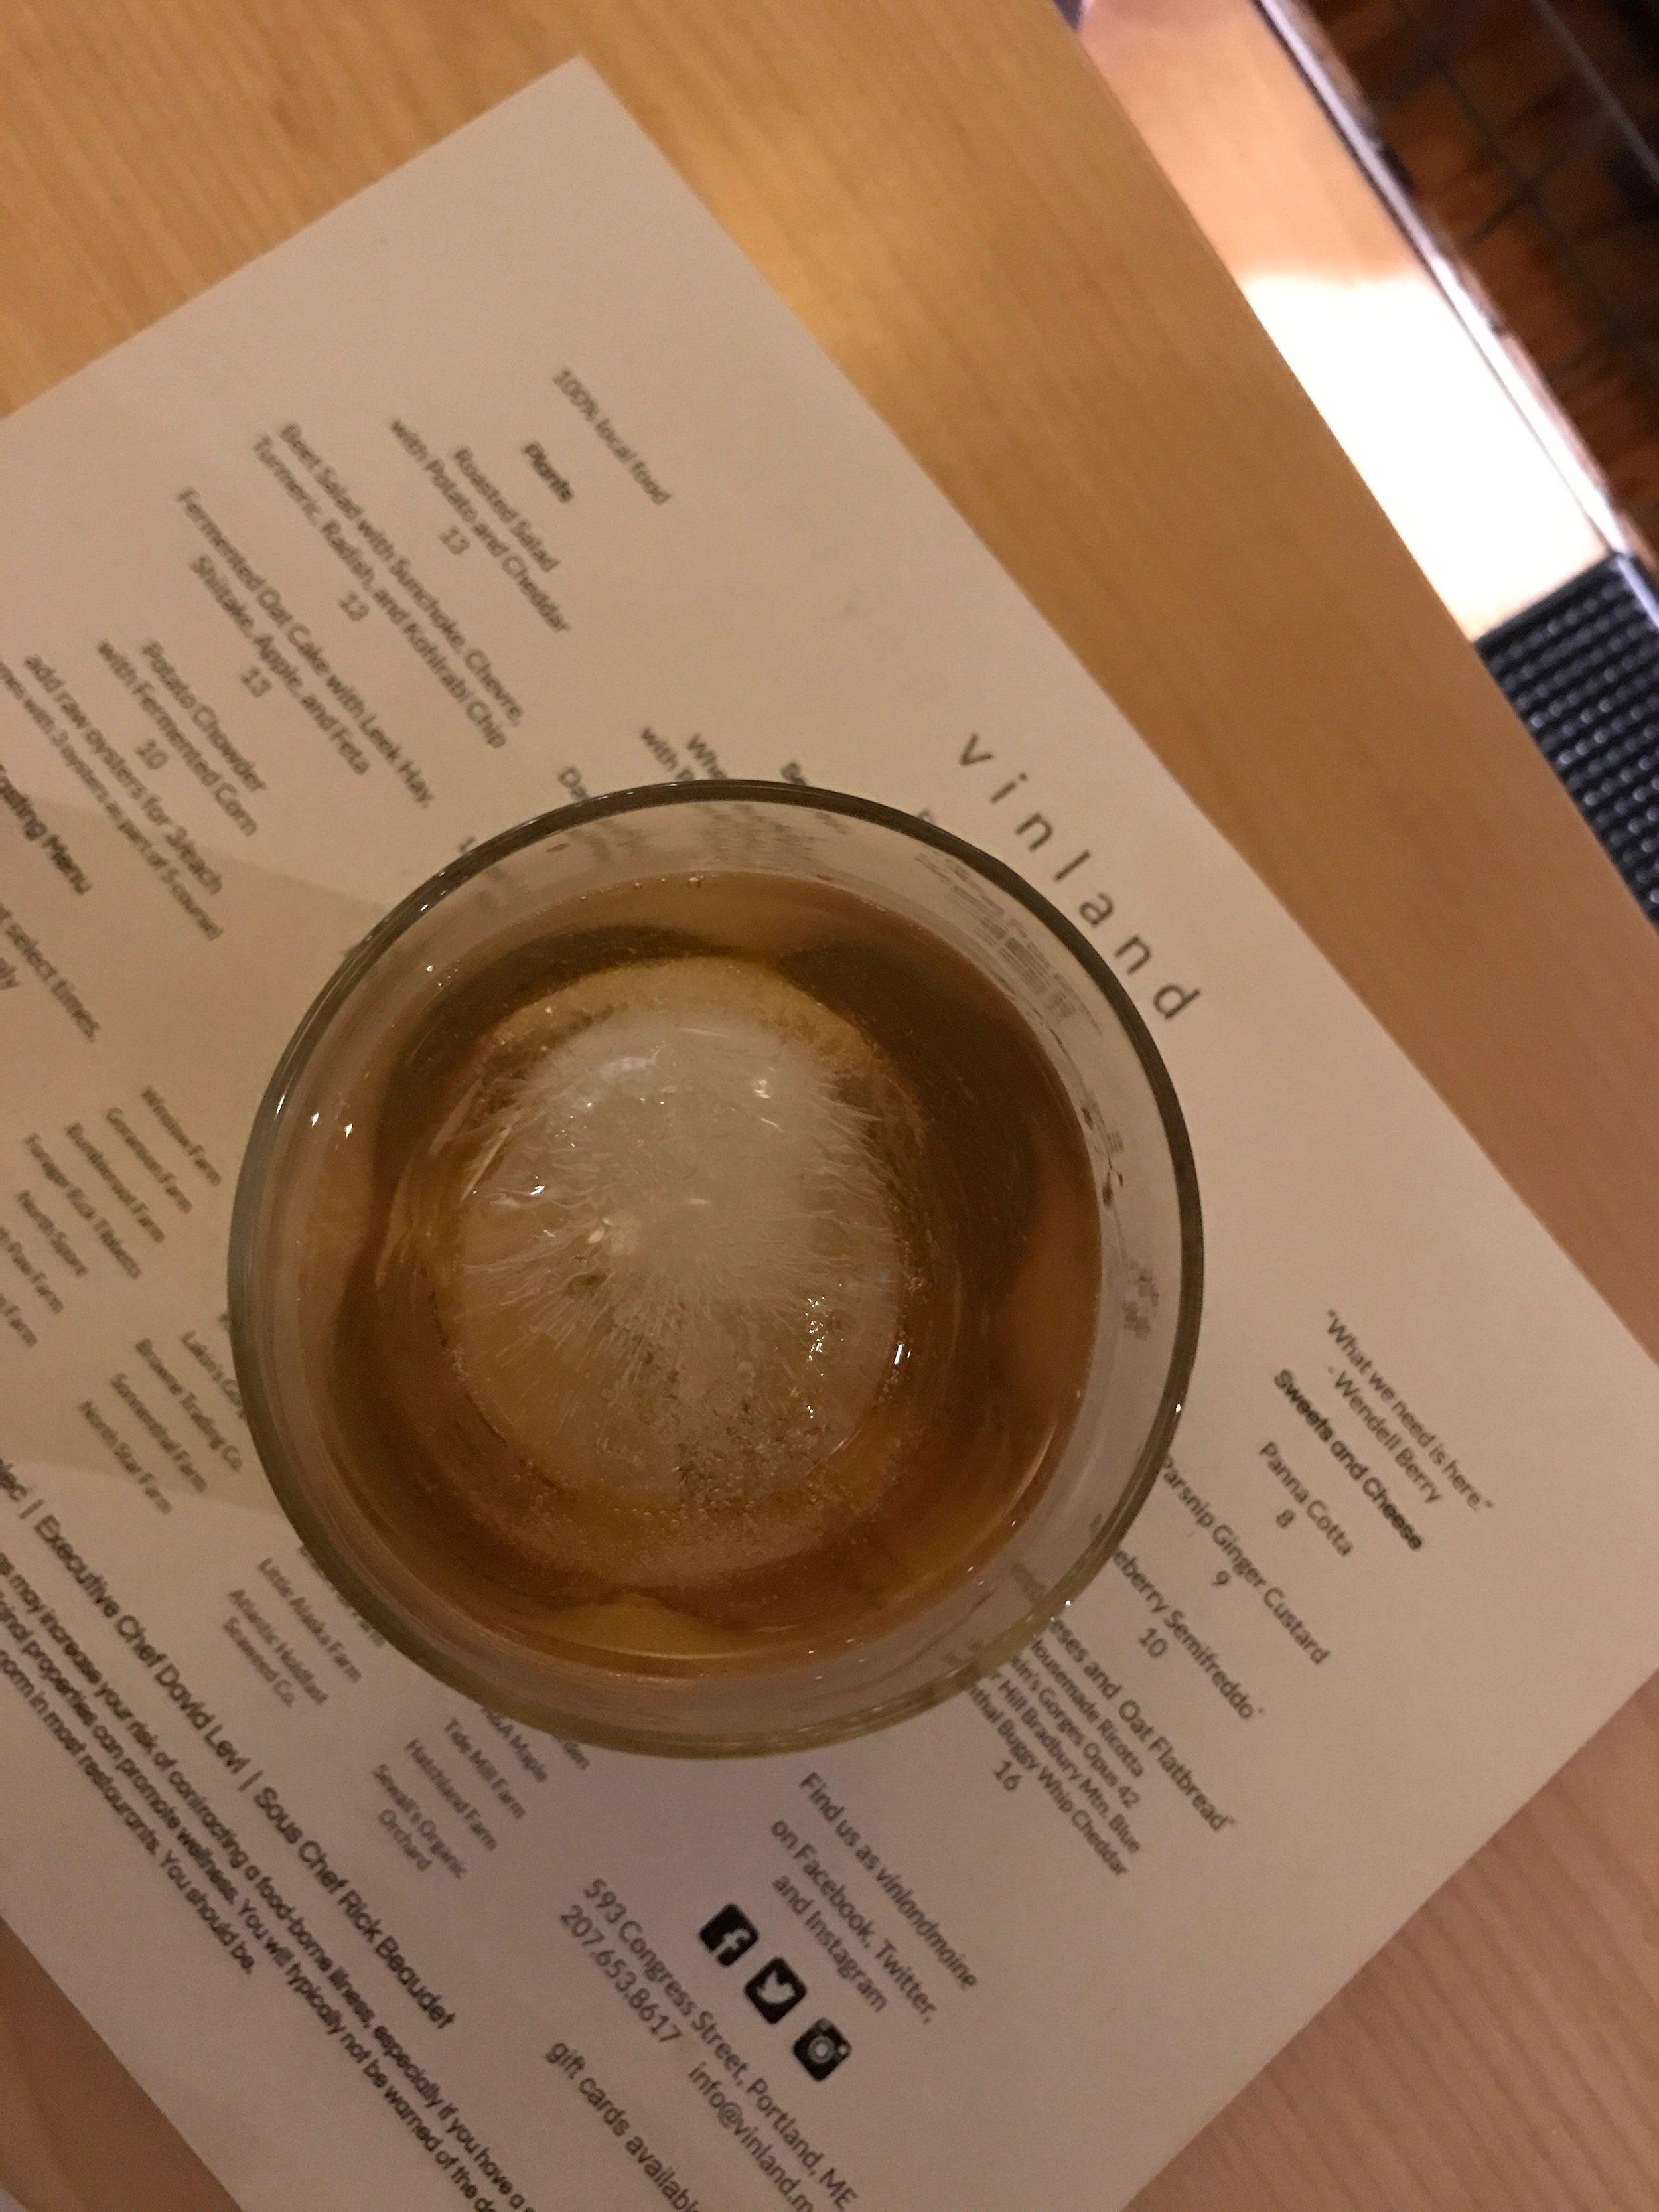 Whiskey + Apple Brandy + Absinthe